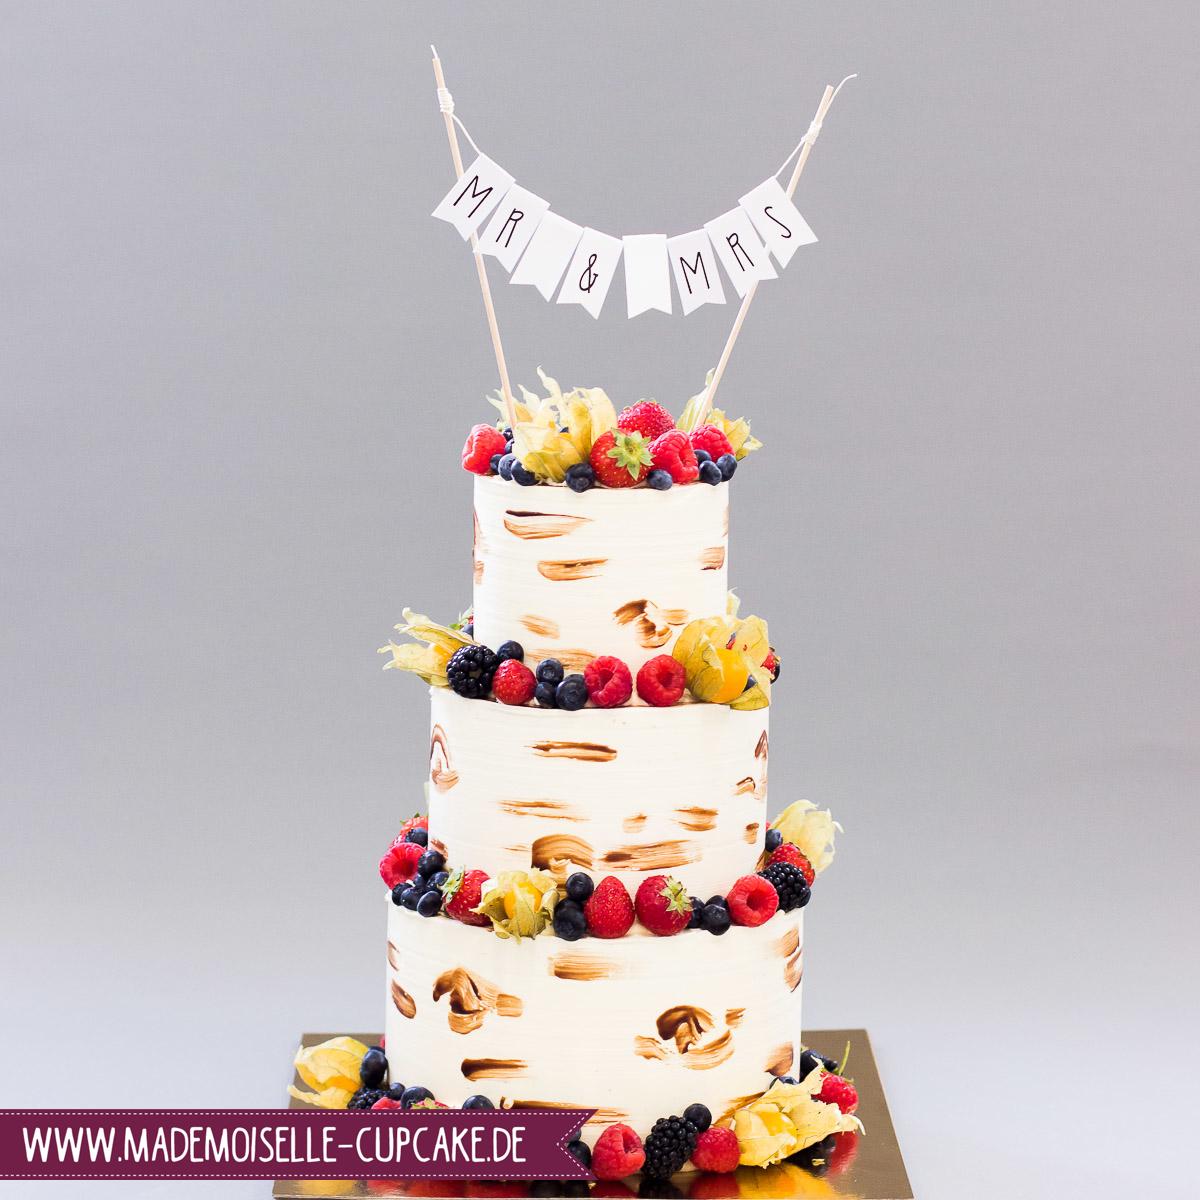 Naked Cake Mademoiselle Cupcake